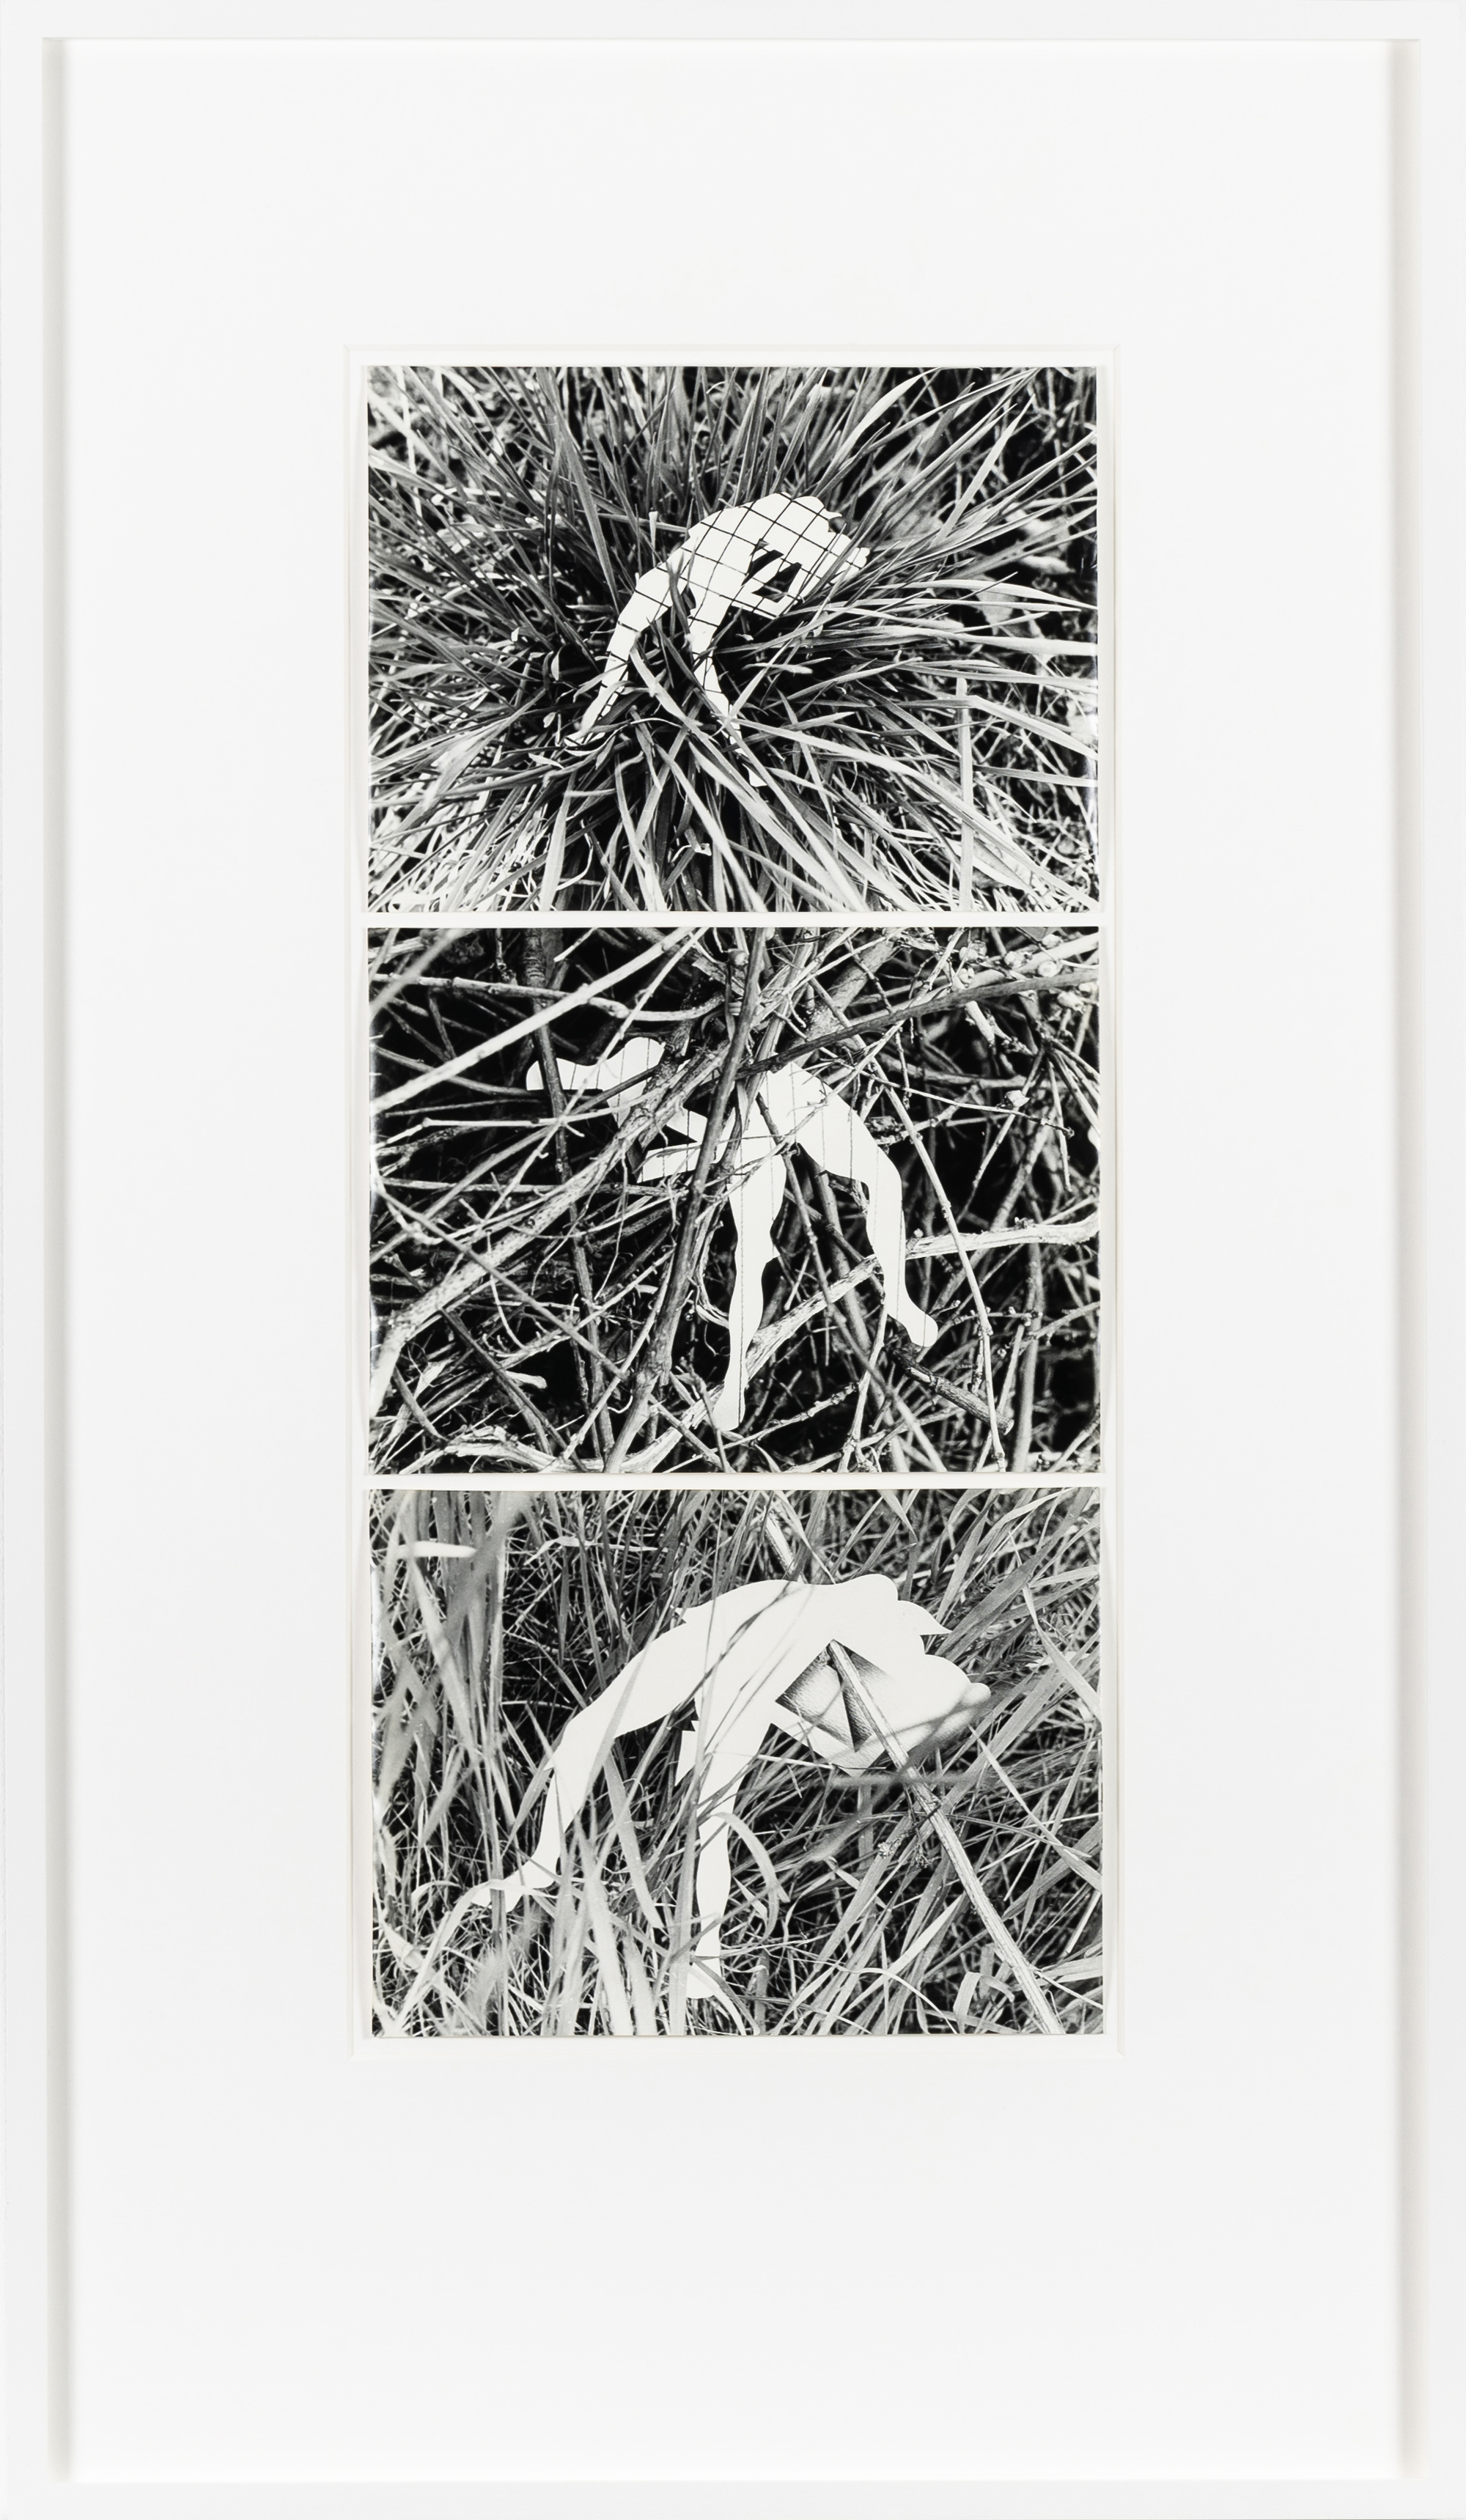 Ferenc Ficzek, Untitled (paper figure, boughs) No. 1-3, 1981, silver gelatin print, 3 prints, 17.8 x 23.8 cm each. Photo: Jan Hecl